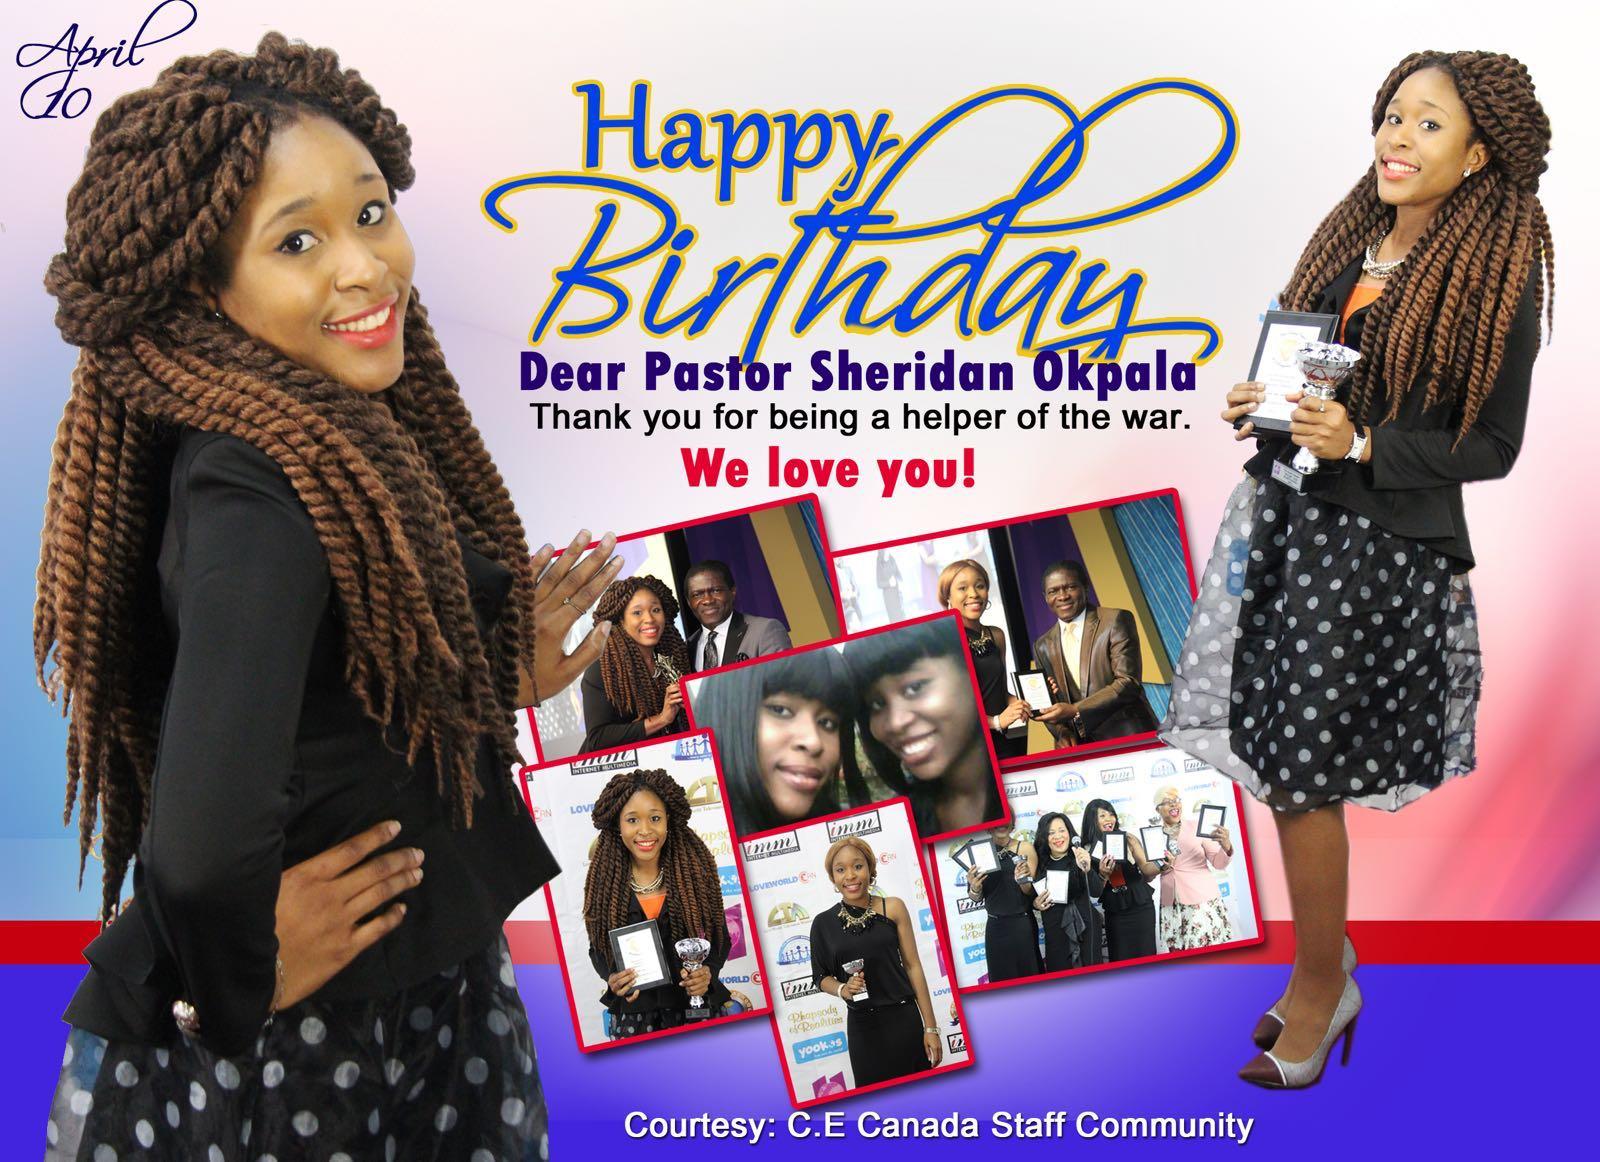 Happy birthday pastor Sheridan. I